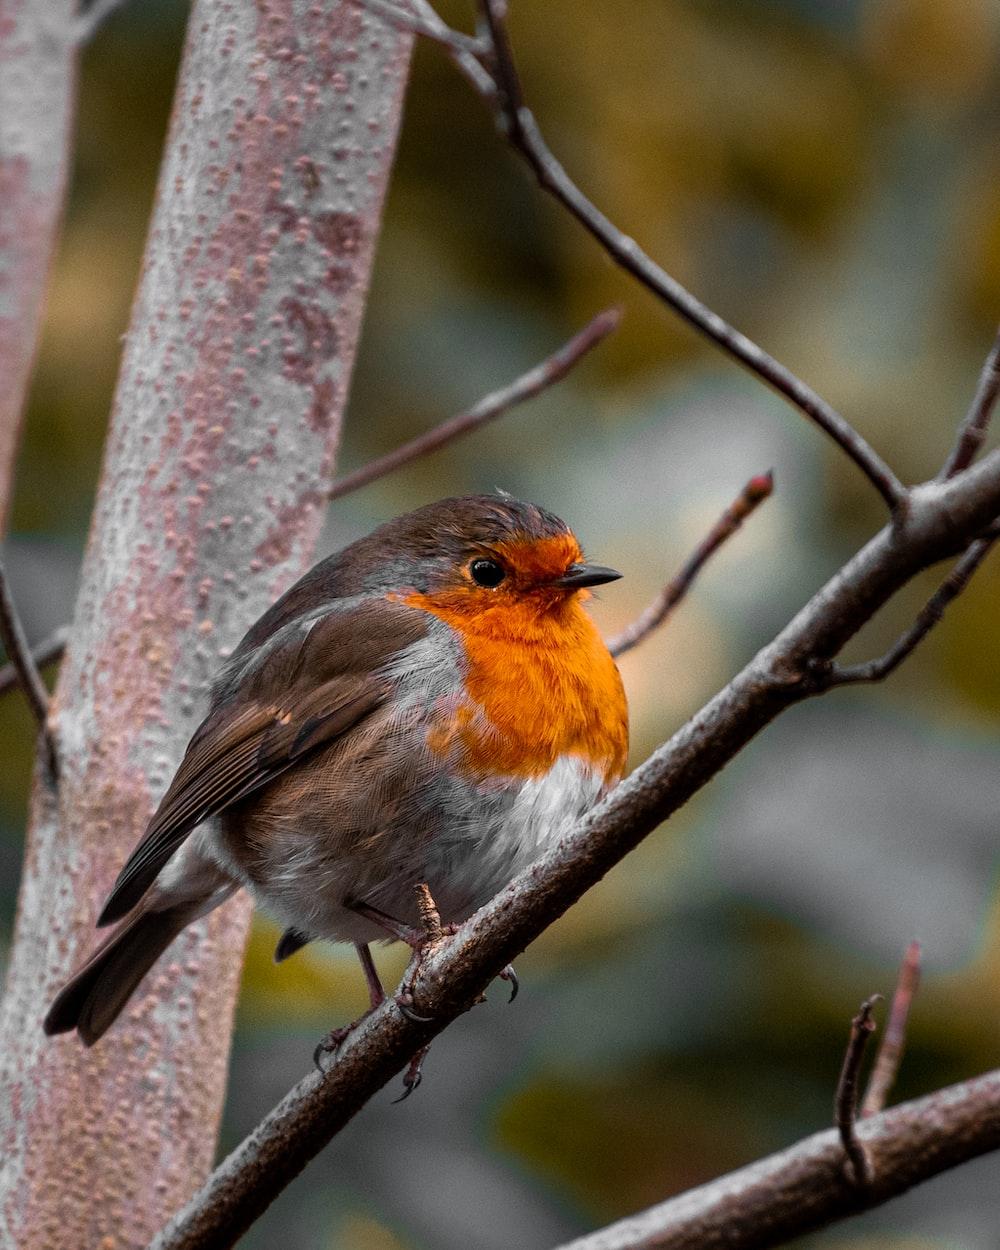 orange and gray bird on tree branch